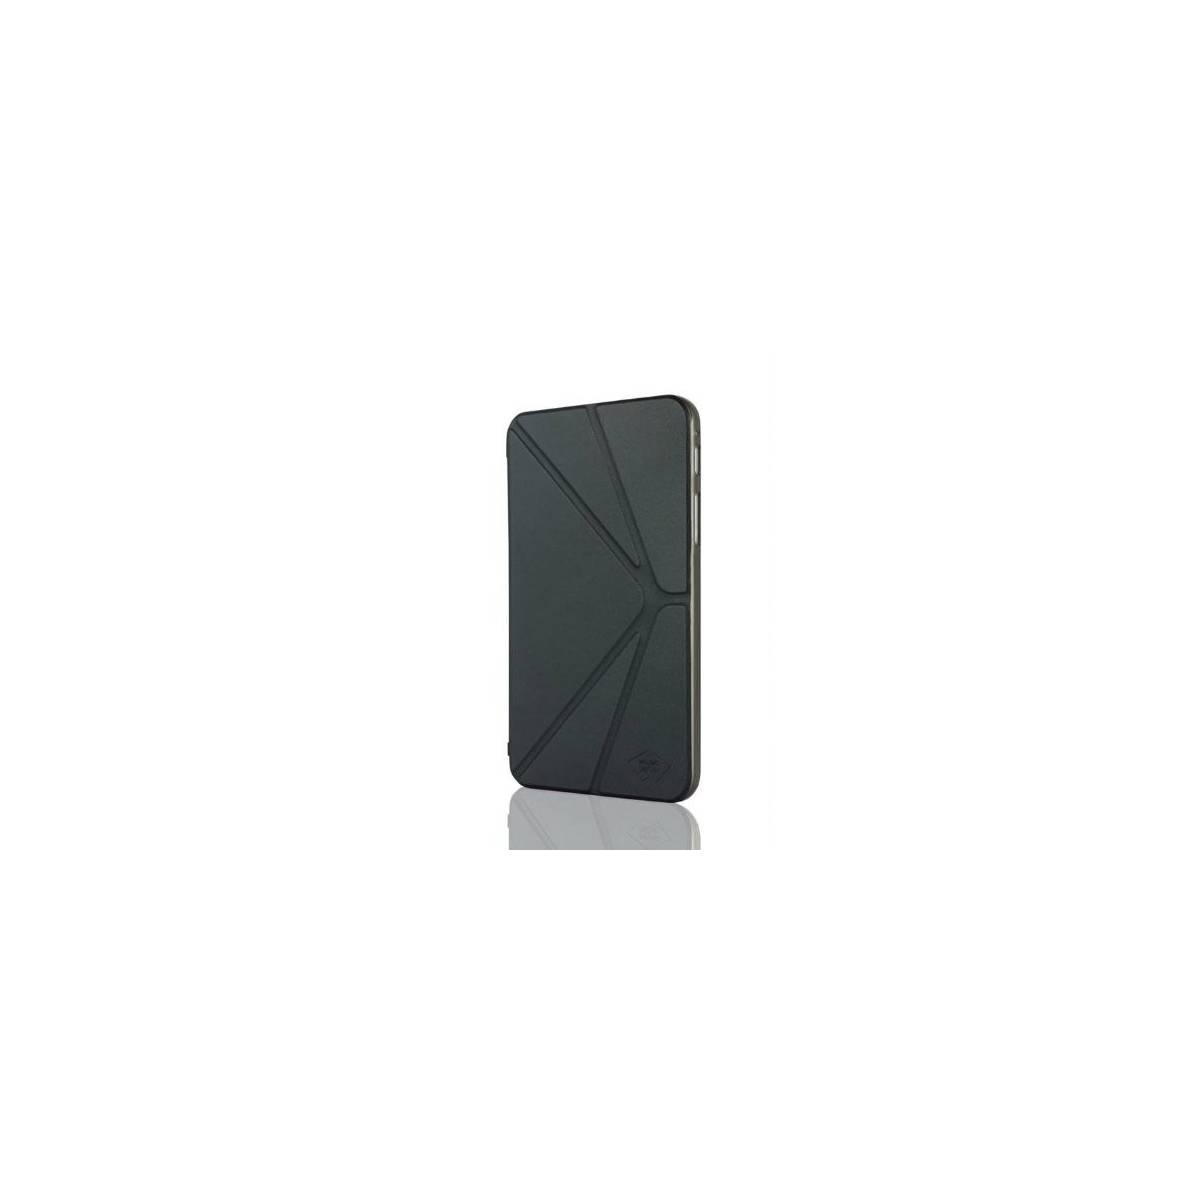 Mosaic Theory Étui pour tablette Samsung Galaxy Tab 3 7.0 noir